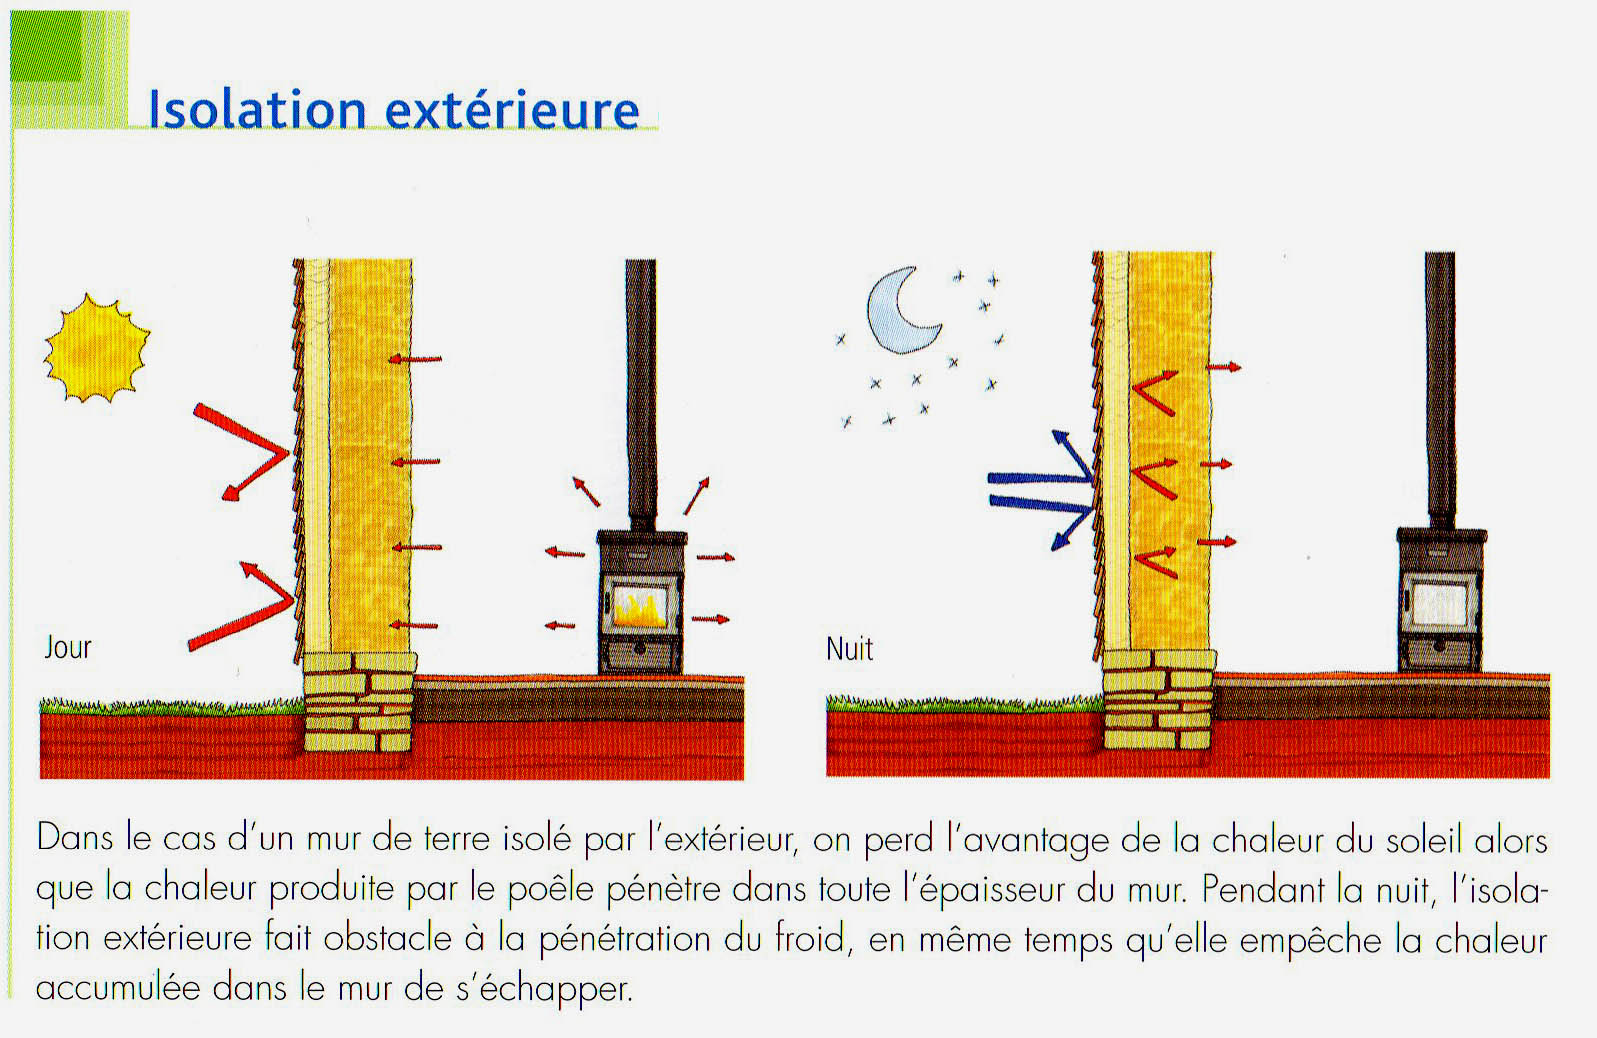 isolation thermique exterieure